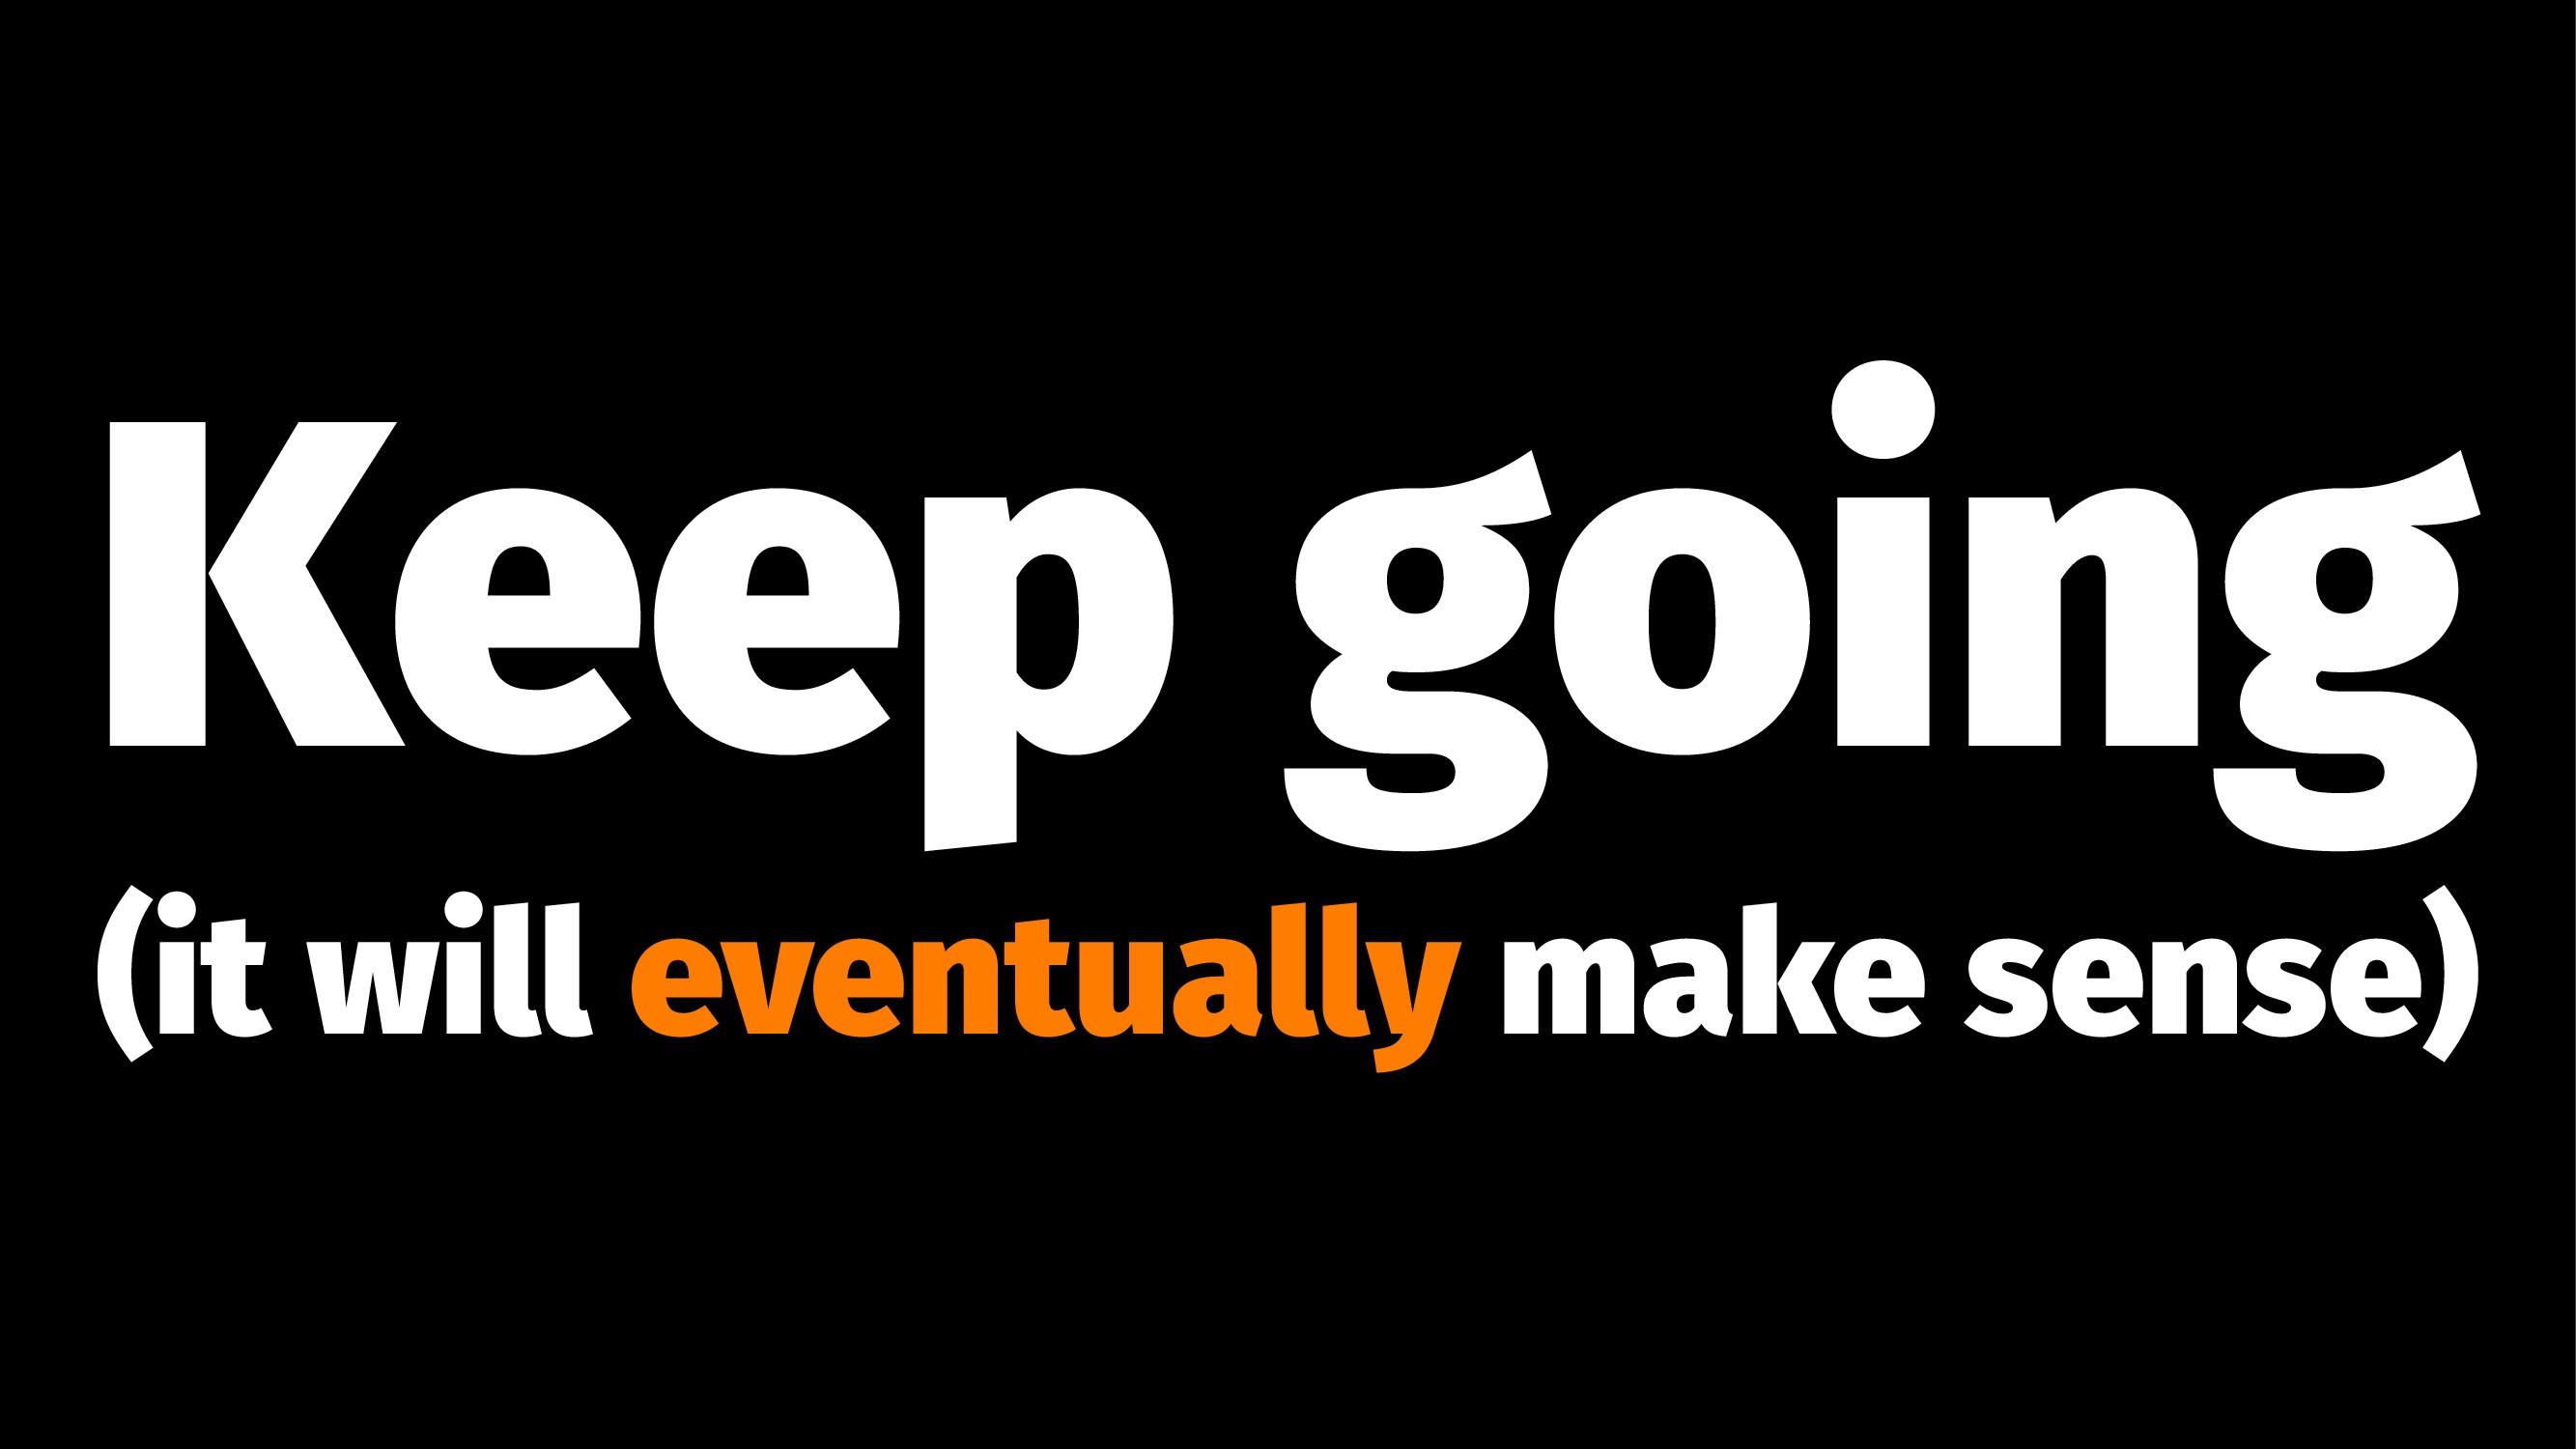 Keep going (it will eventually make sense)